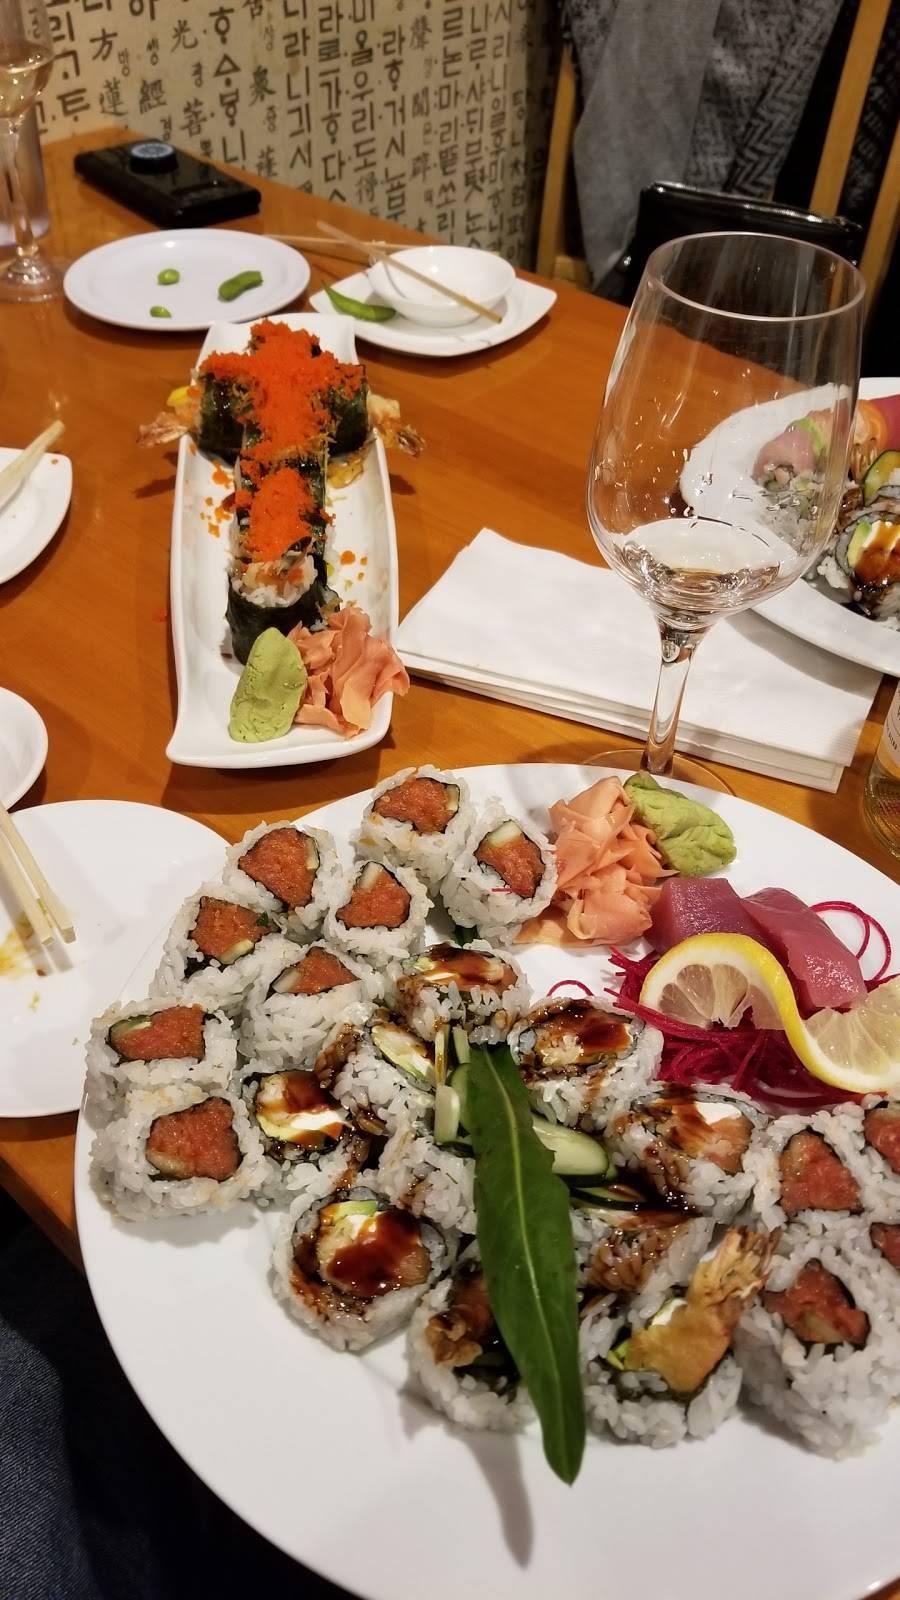 Sushi Yaki | restaurant | 129 N Arlington Heights Rd, Buffalo Grove, IL 60089, USA | 8475207850 OR +1 847-520-7850